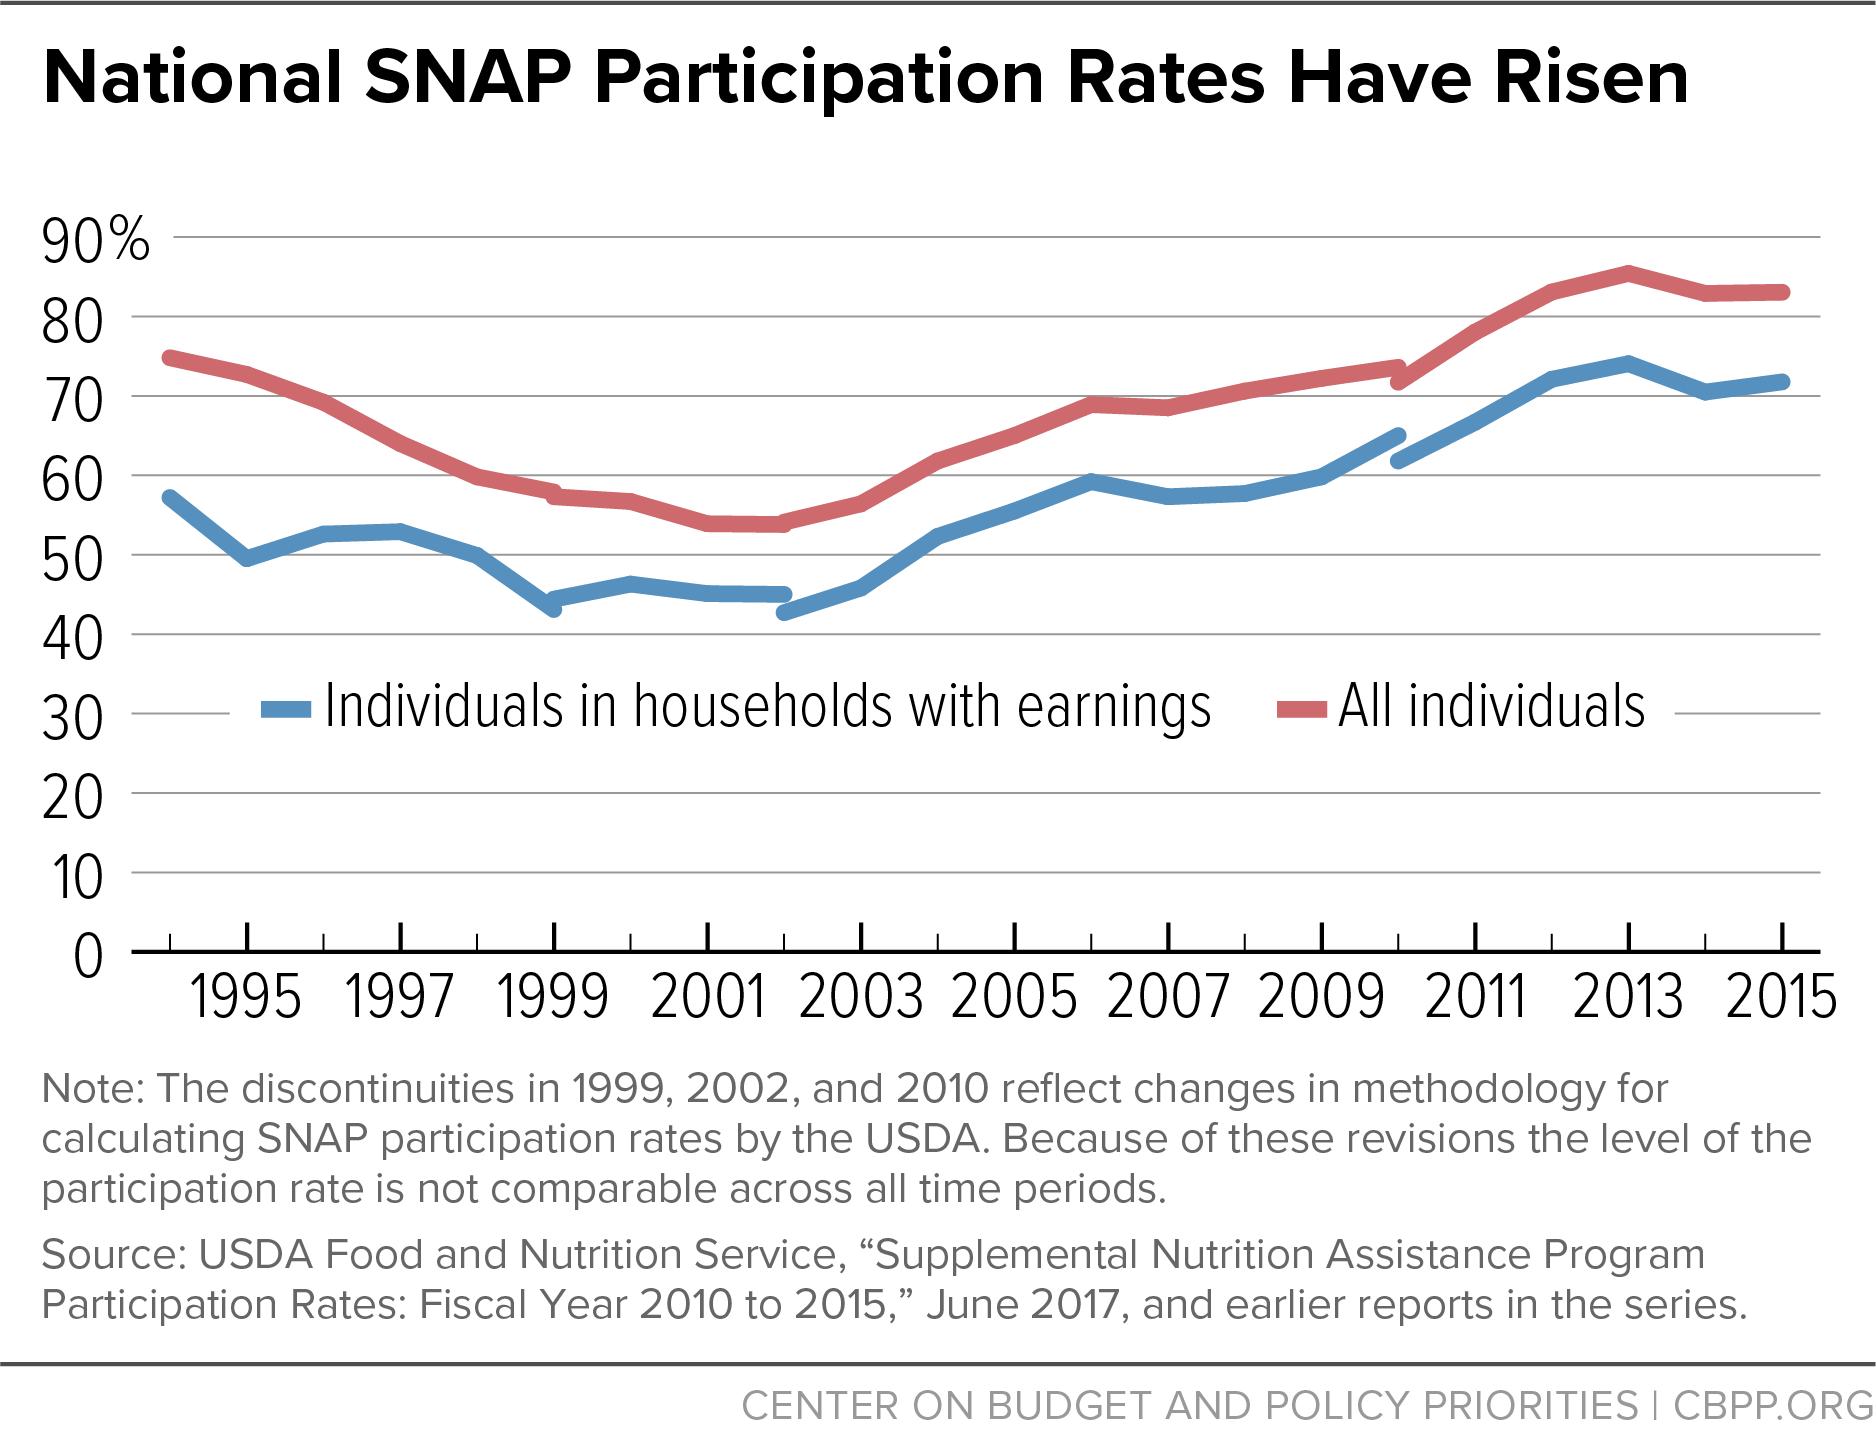 National SNAP Participation Rates Have Risen